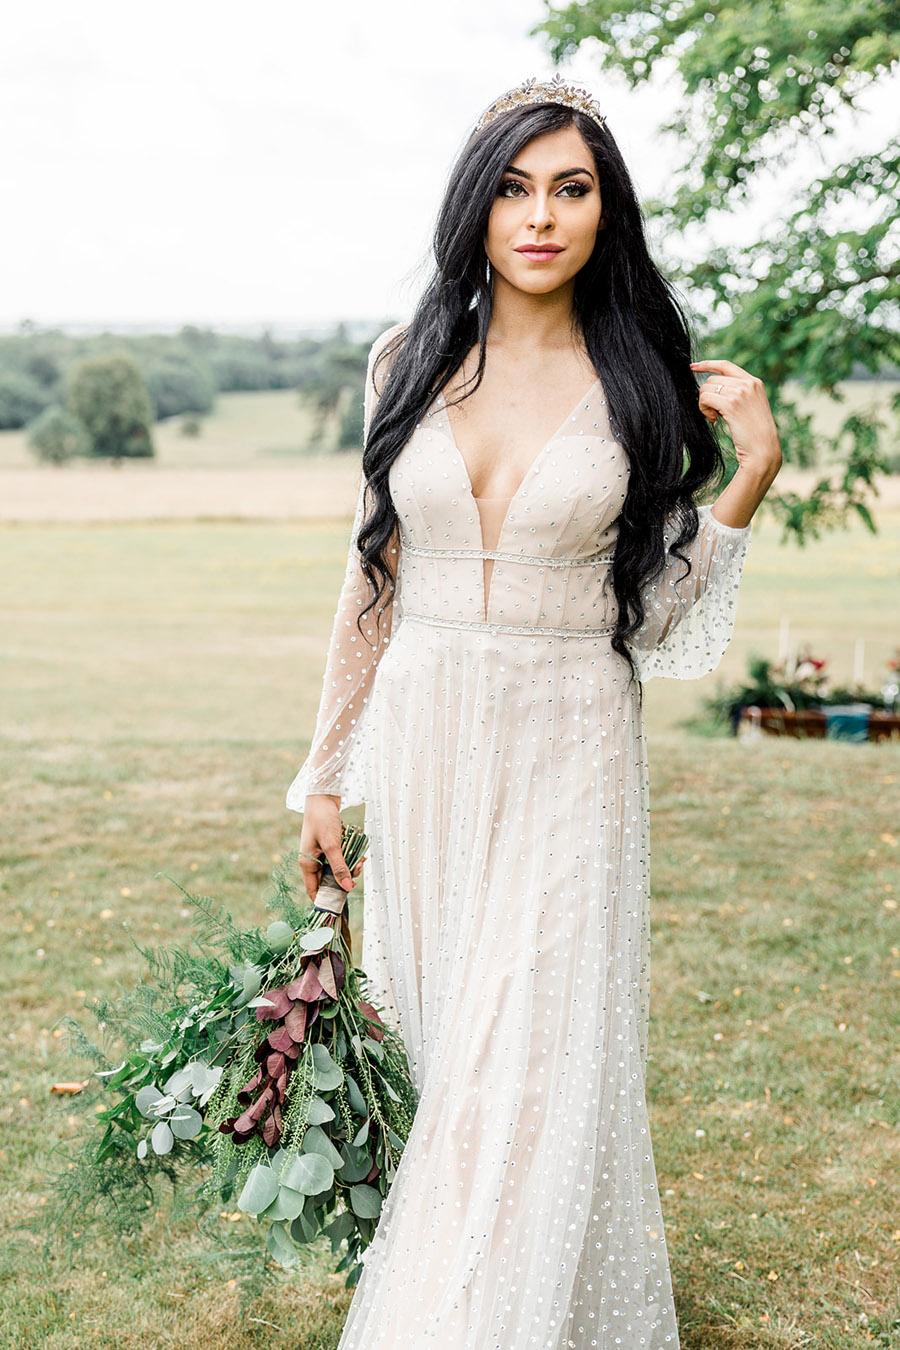 Modern Boho wedding style inspiration from Slindon House, photographer credit Kelsie Scully Photography (21)